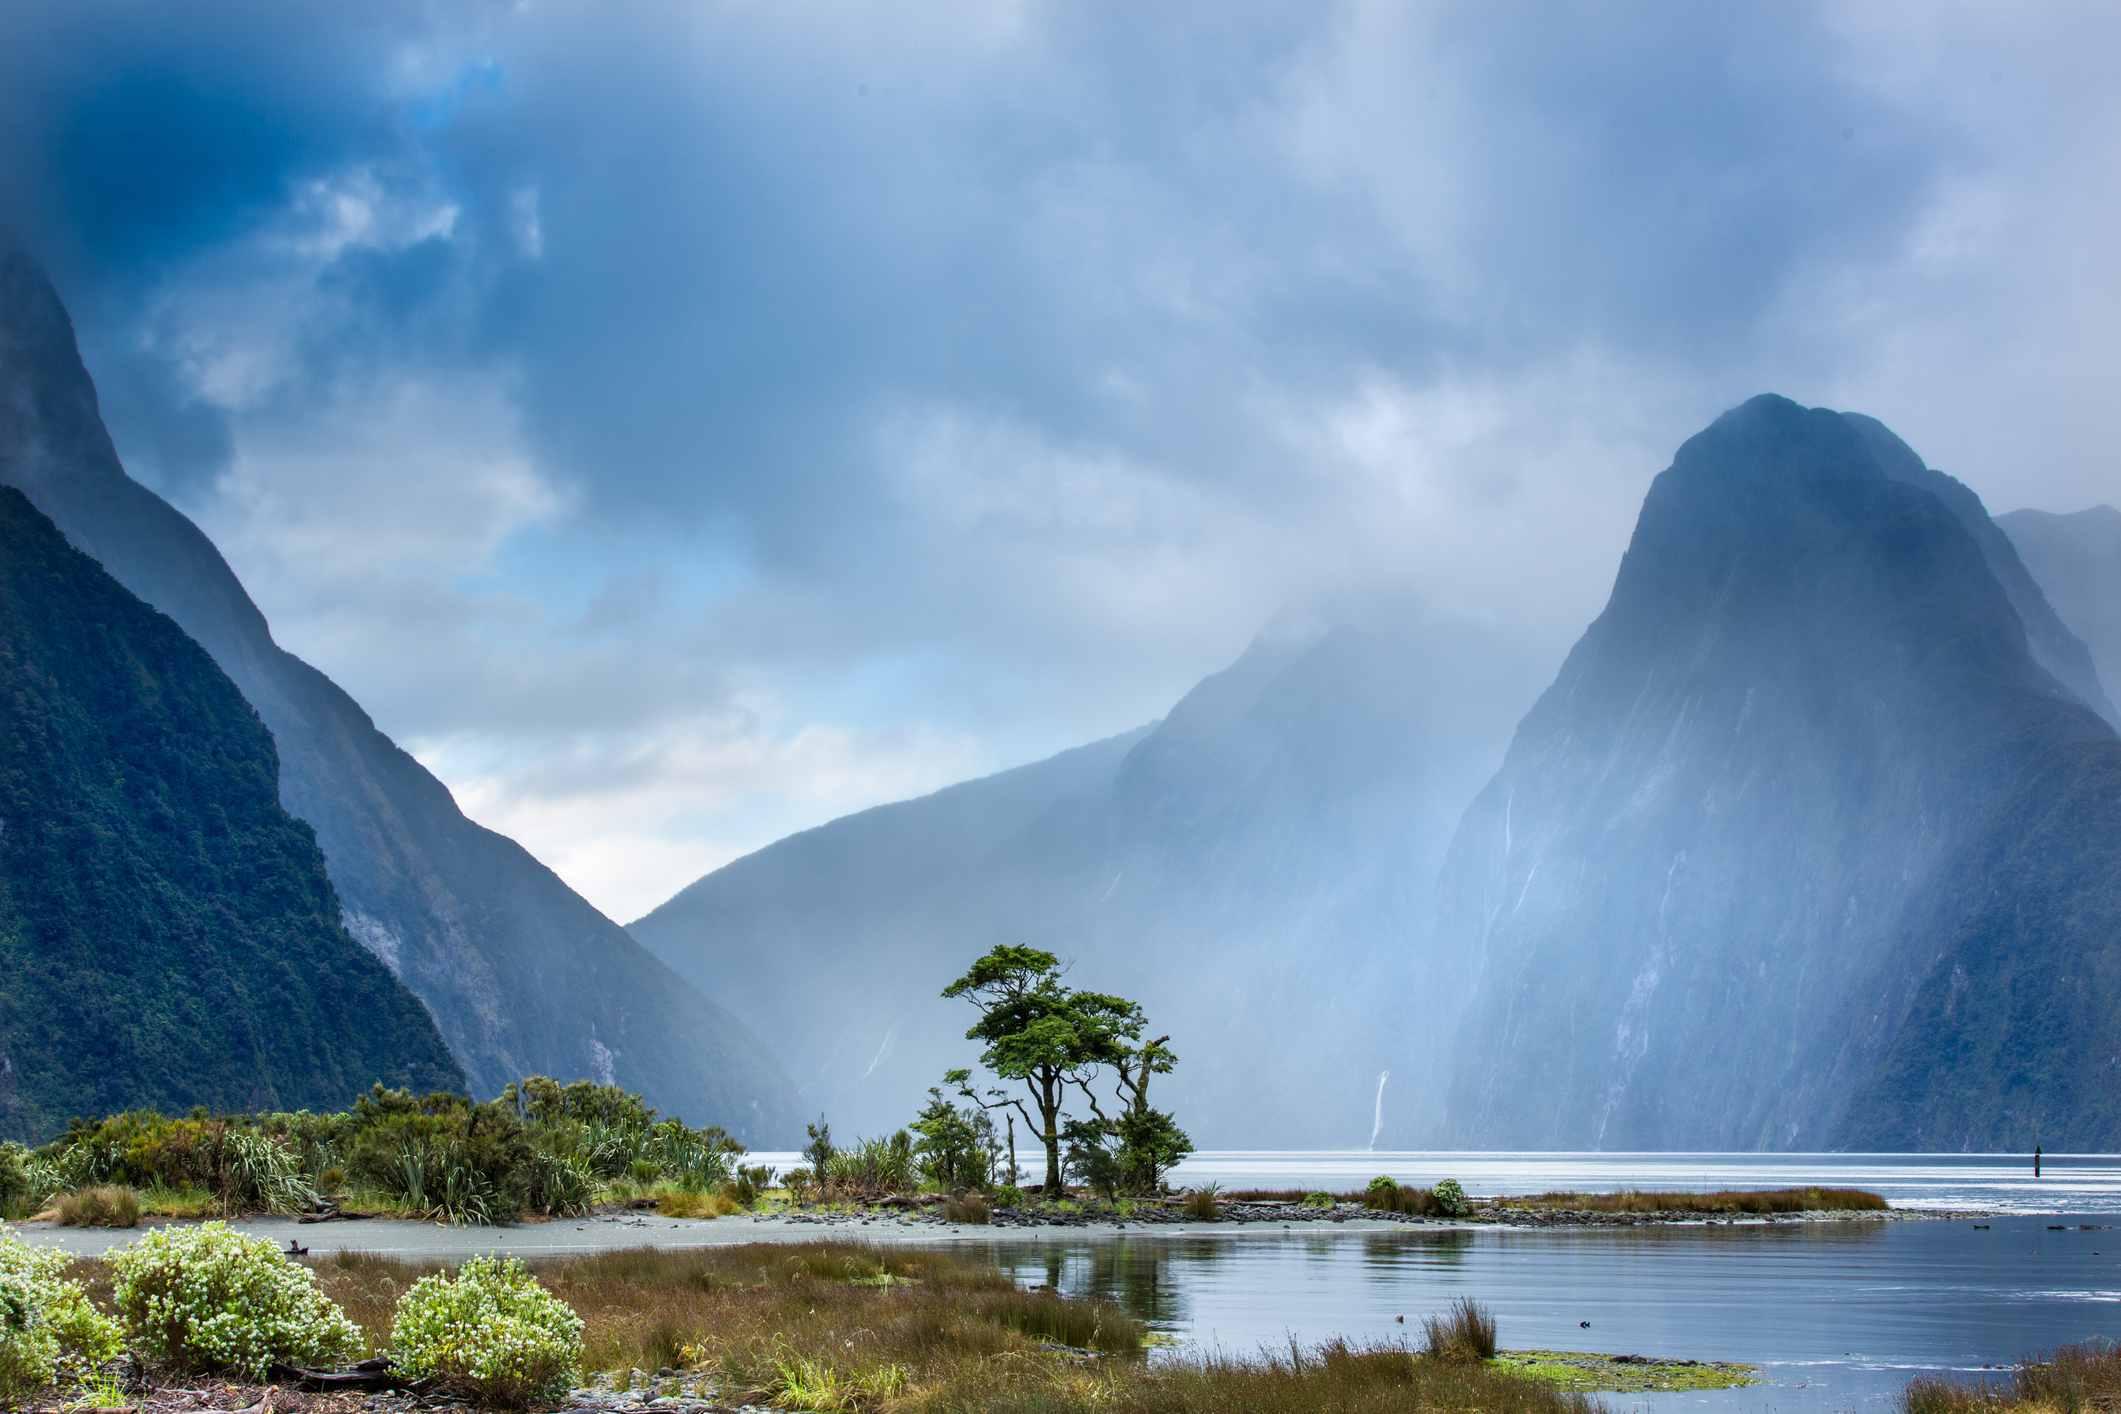 ilford Sound, Fiordland National Park, UNESCO World Heritage Site, Piopiotahi Marine Reserve, South Island, New Zealand, Pacific